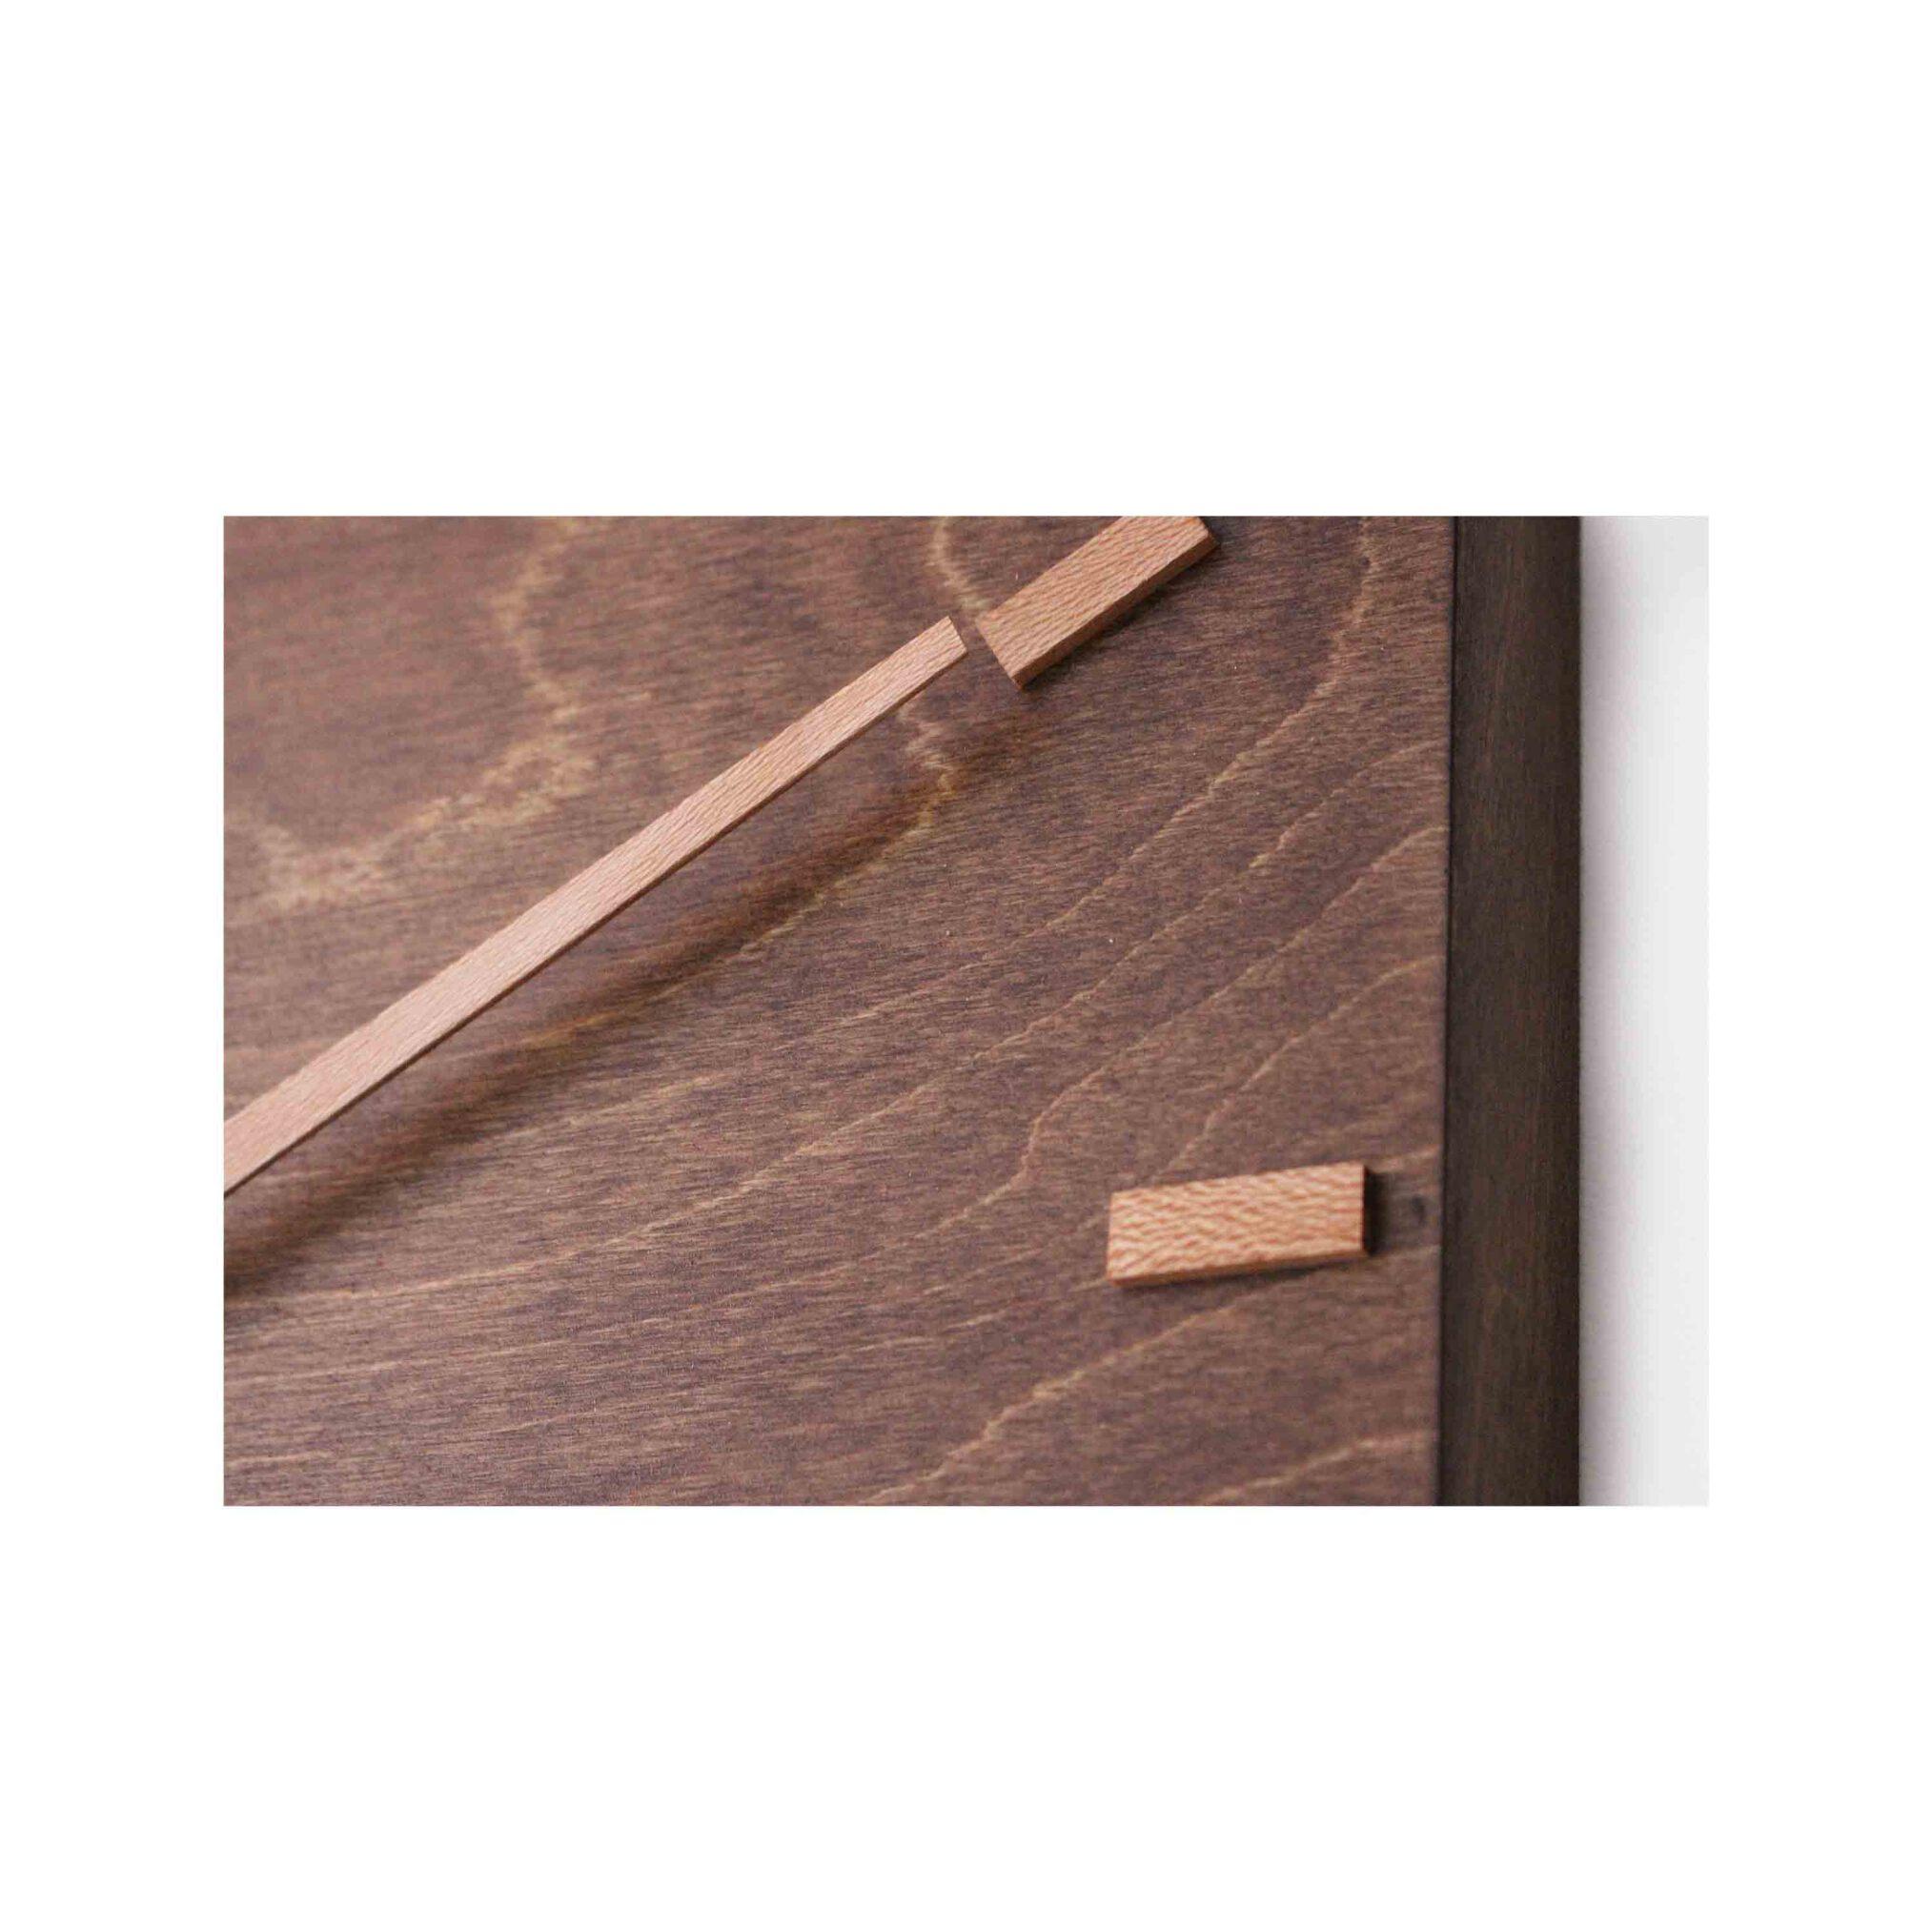 ساعت چوبی دیواری، ساعت کادویی